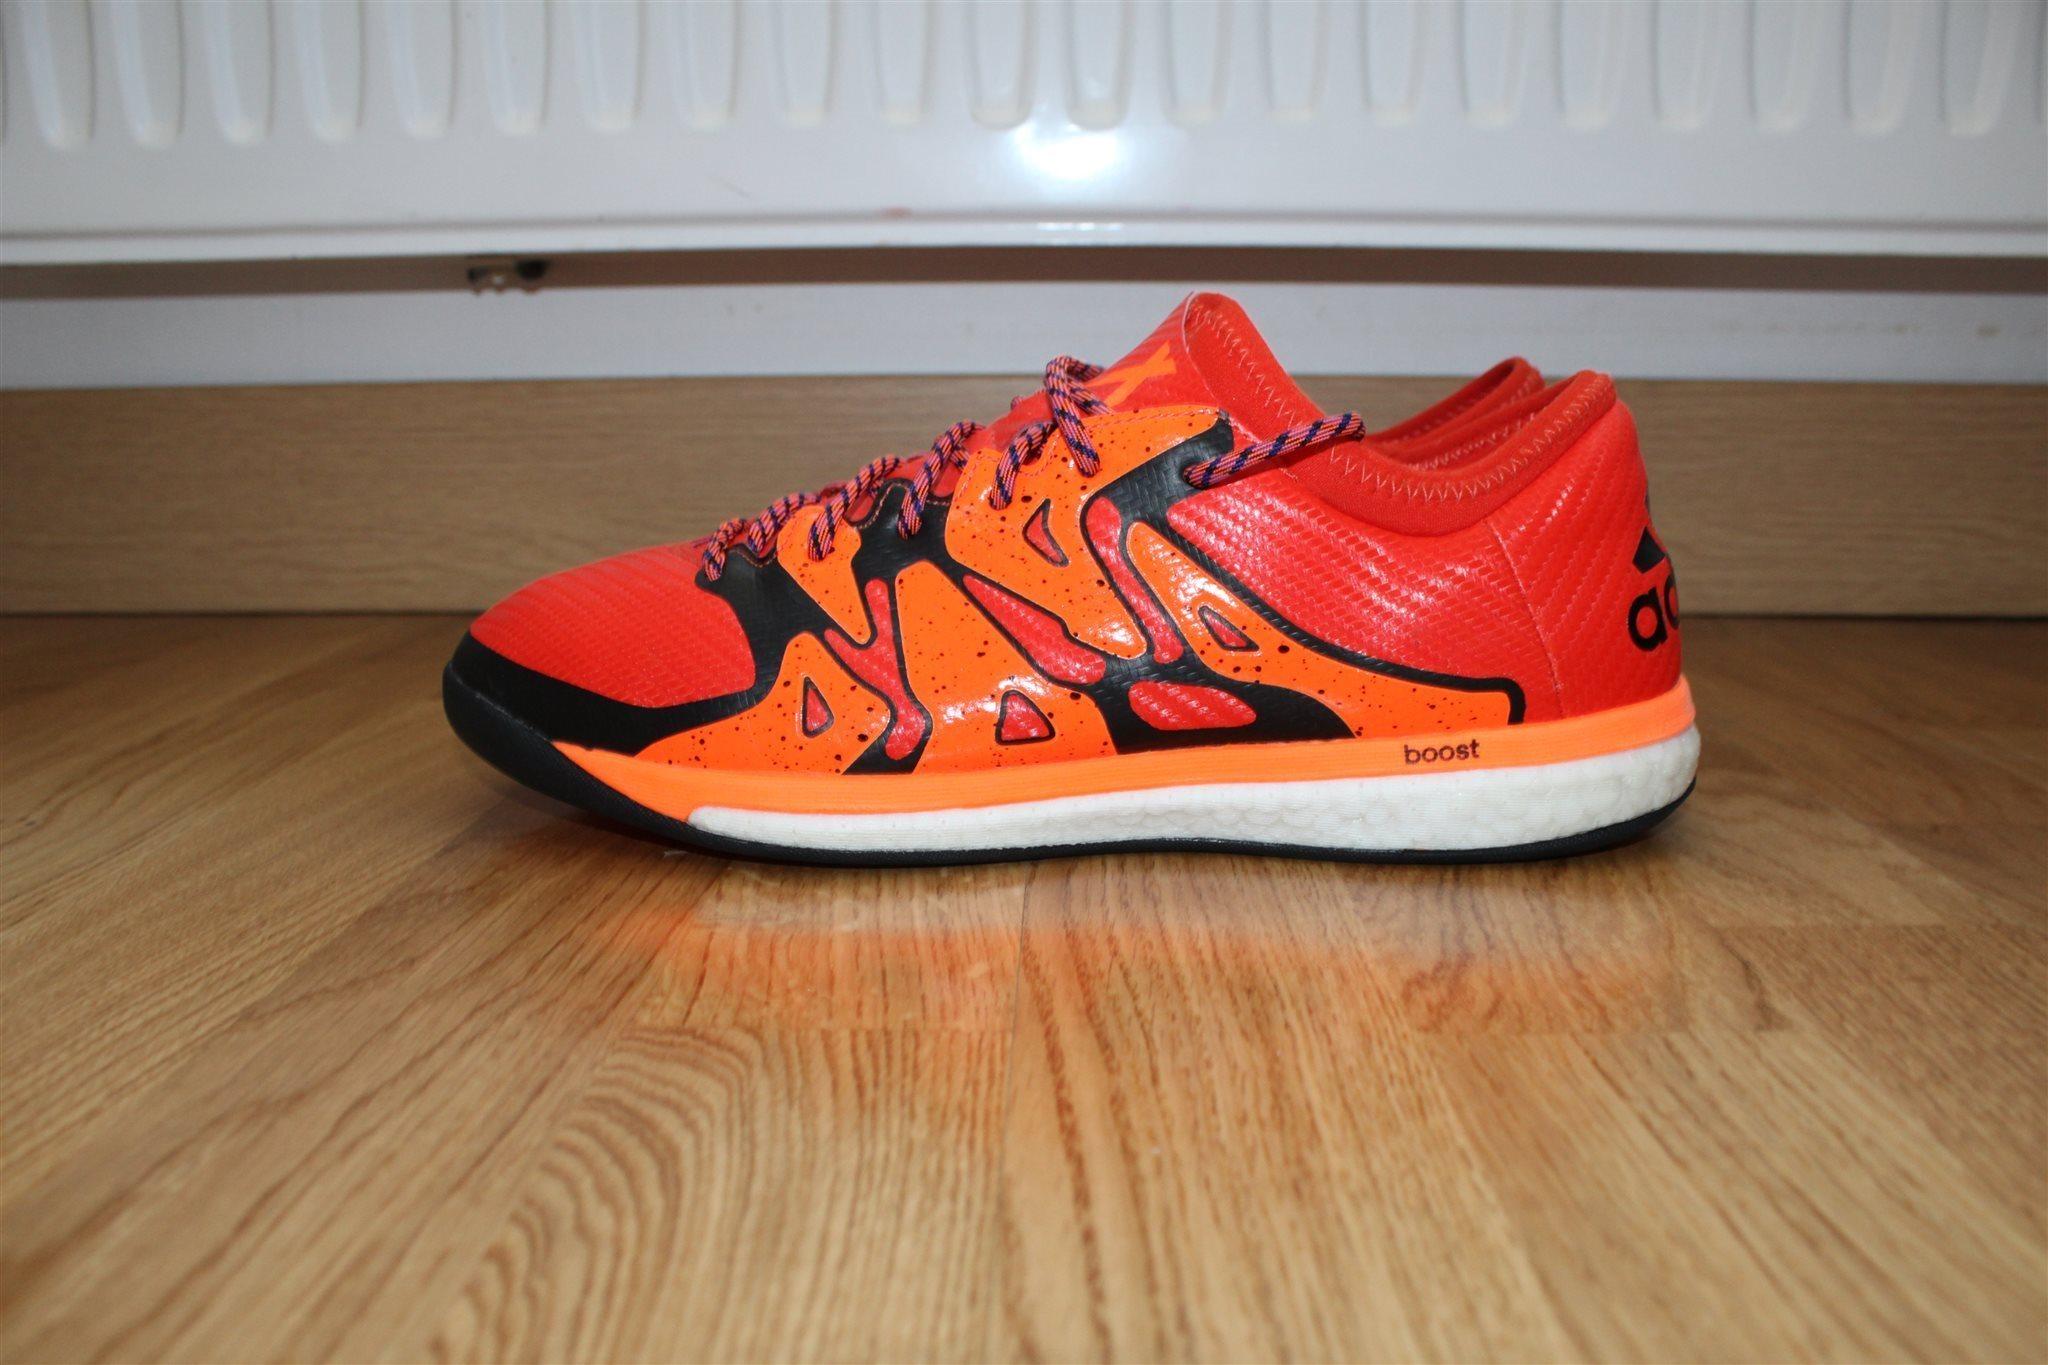 the best attitude 47296 f1dd6 ... training skor från adidas x 15.1 boost orange svart i stl 44